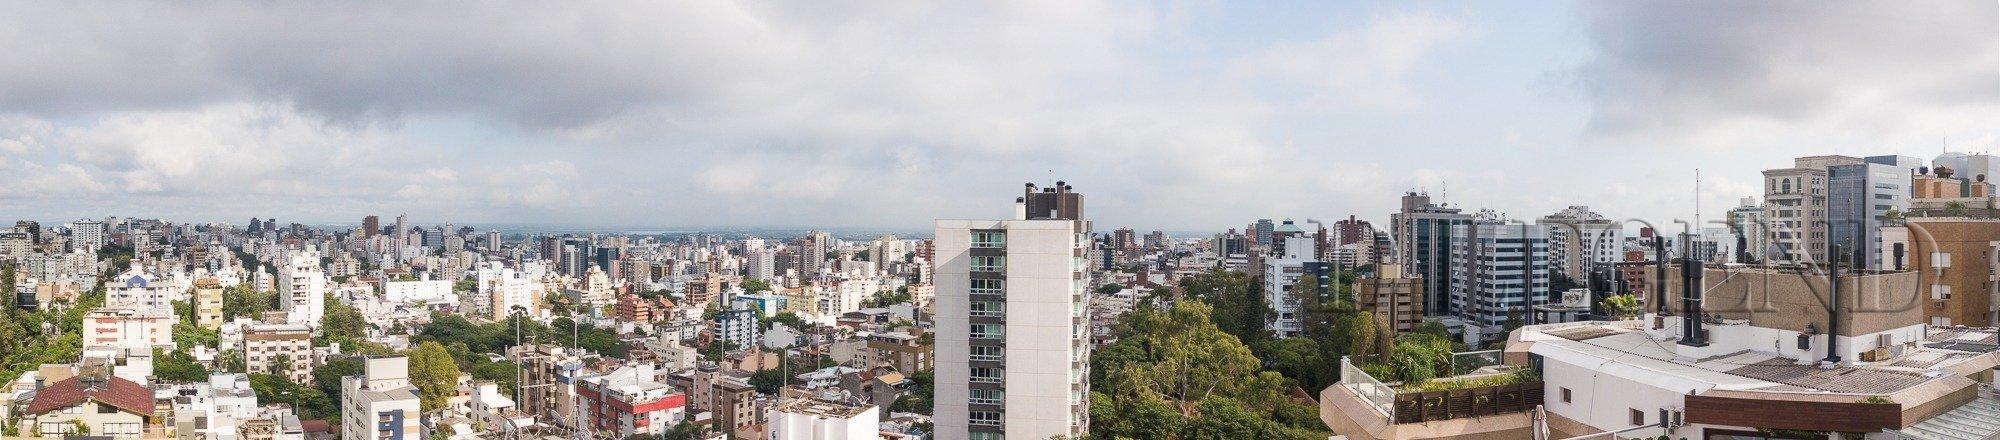 AG Anita Garibaldi Offices - Rua Anita Garibaldi, 1143 - Mont Serrat - Porto Alegre